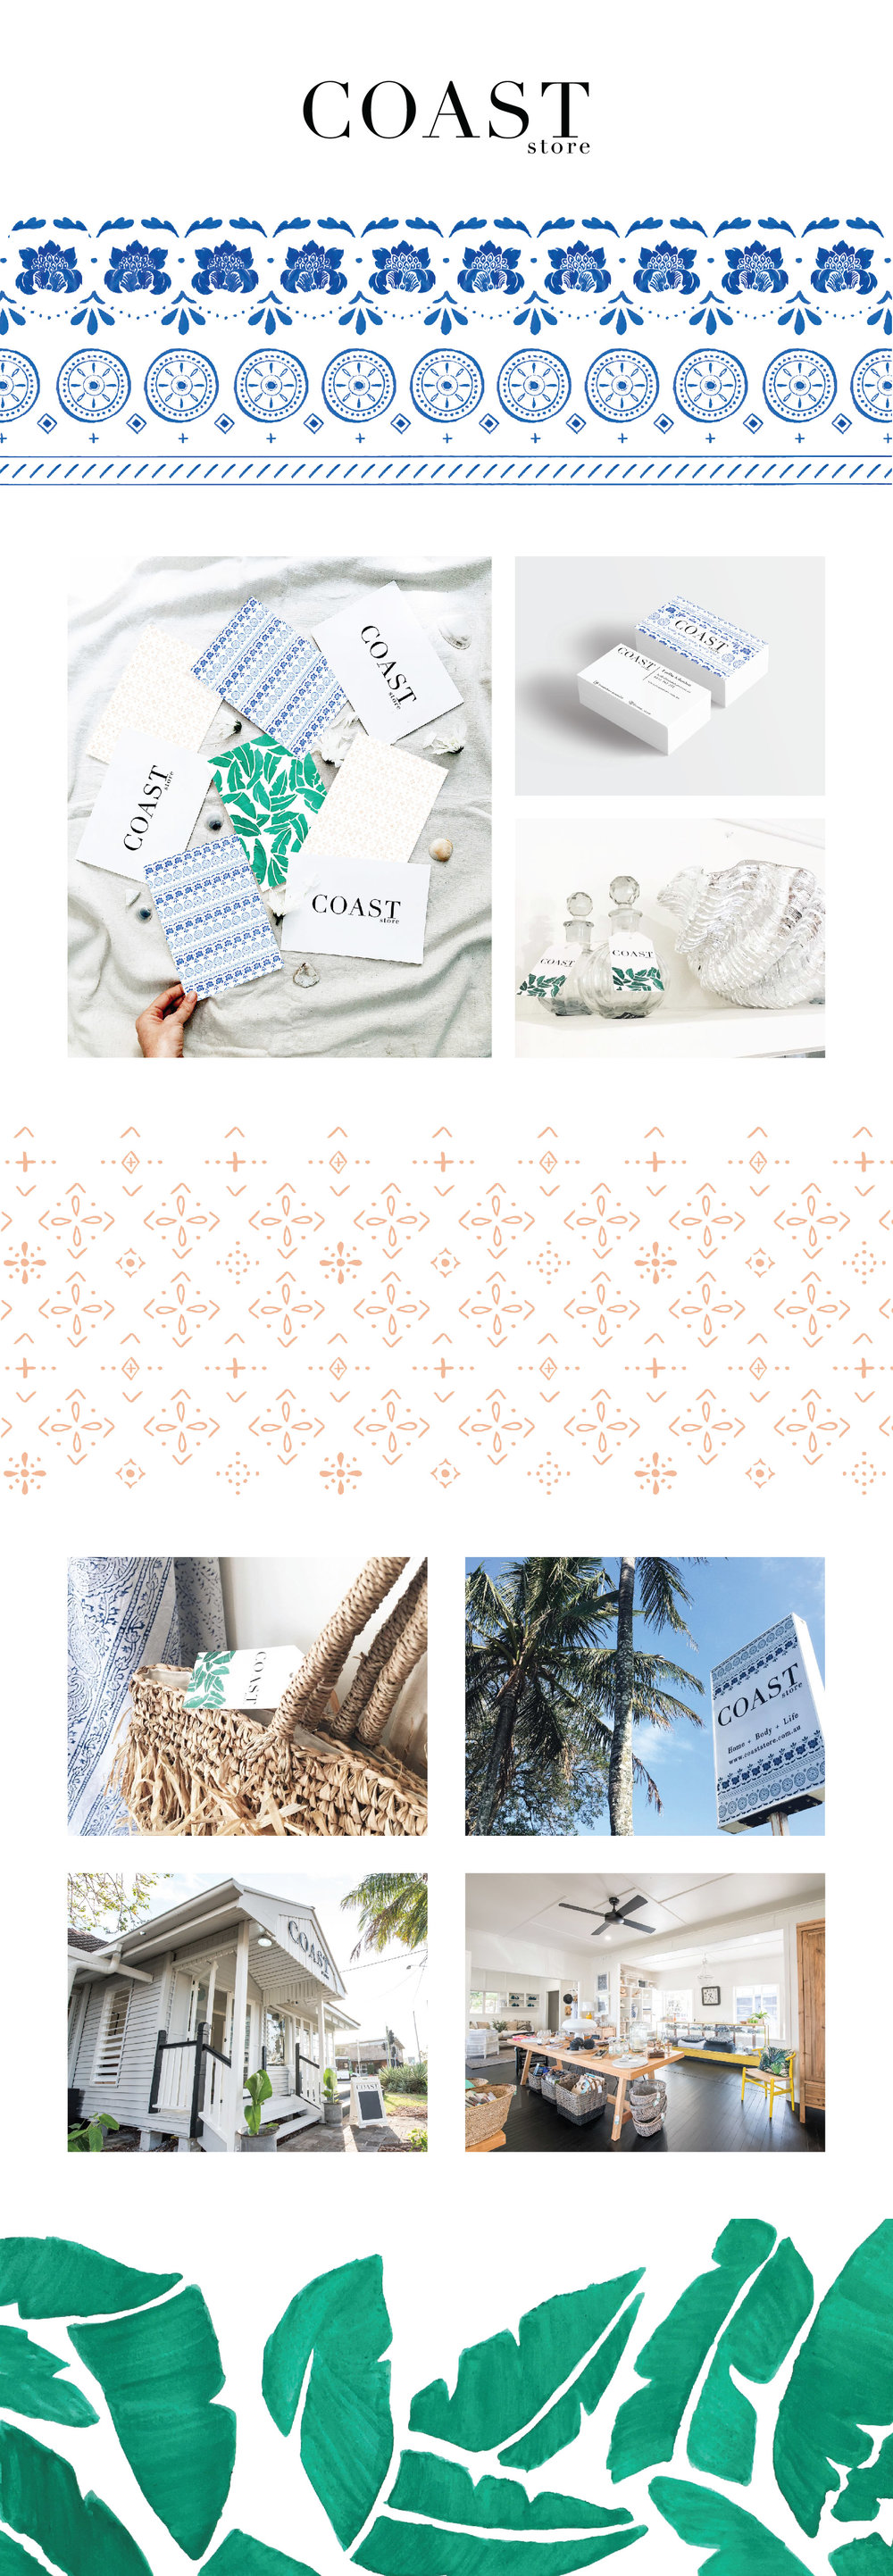 Coast Store Branding